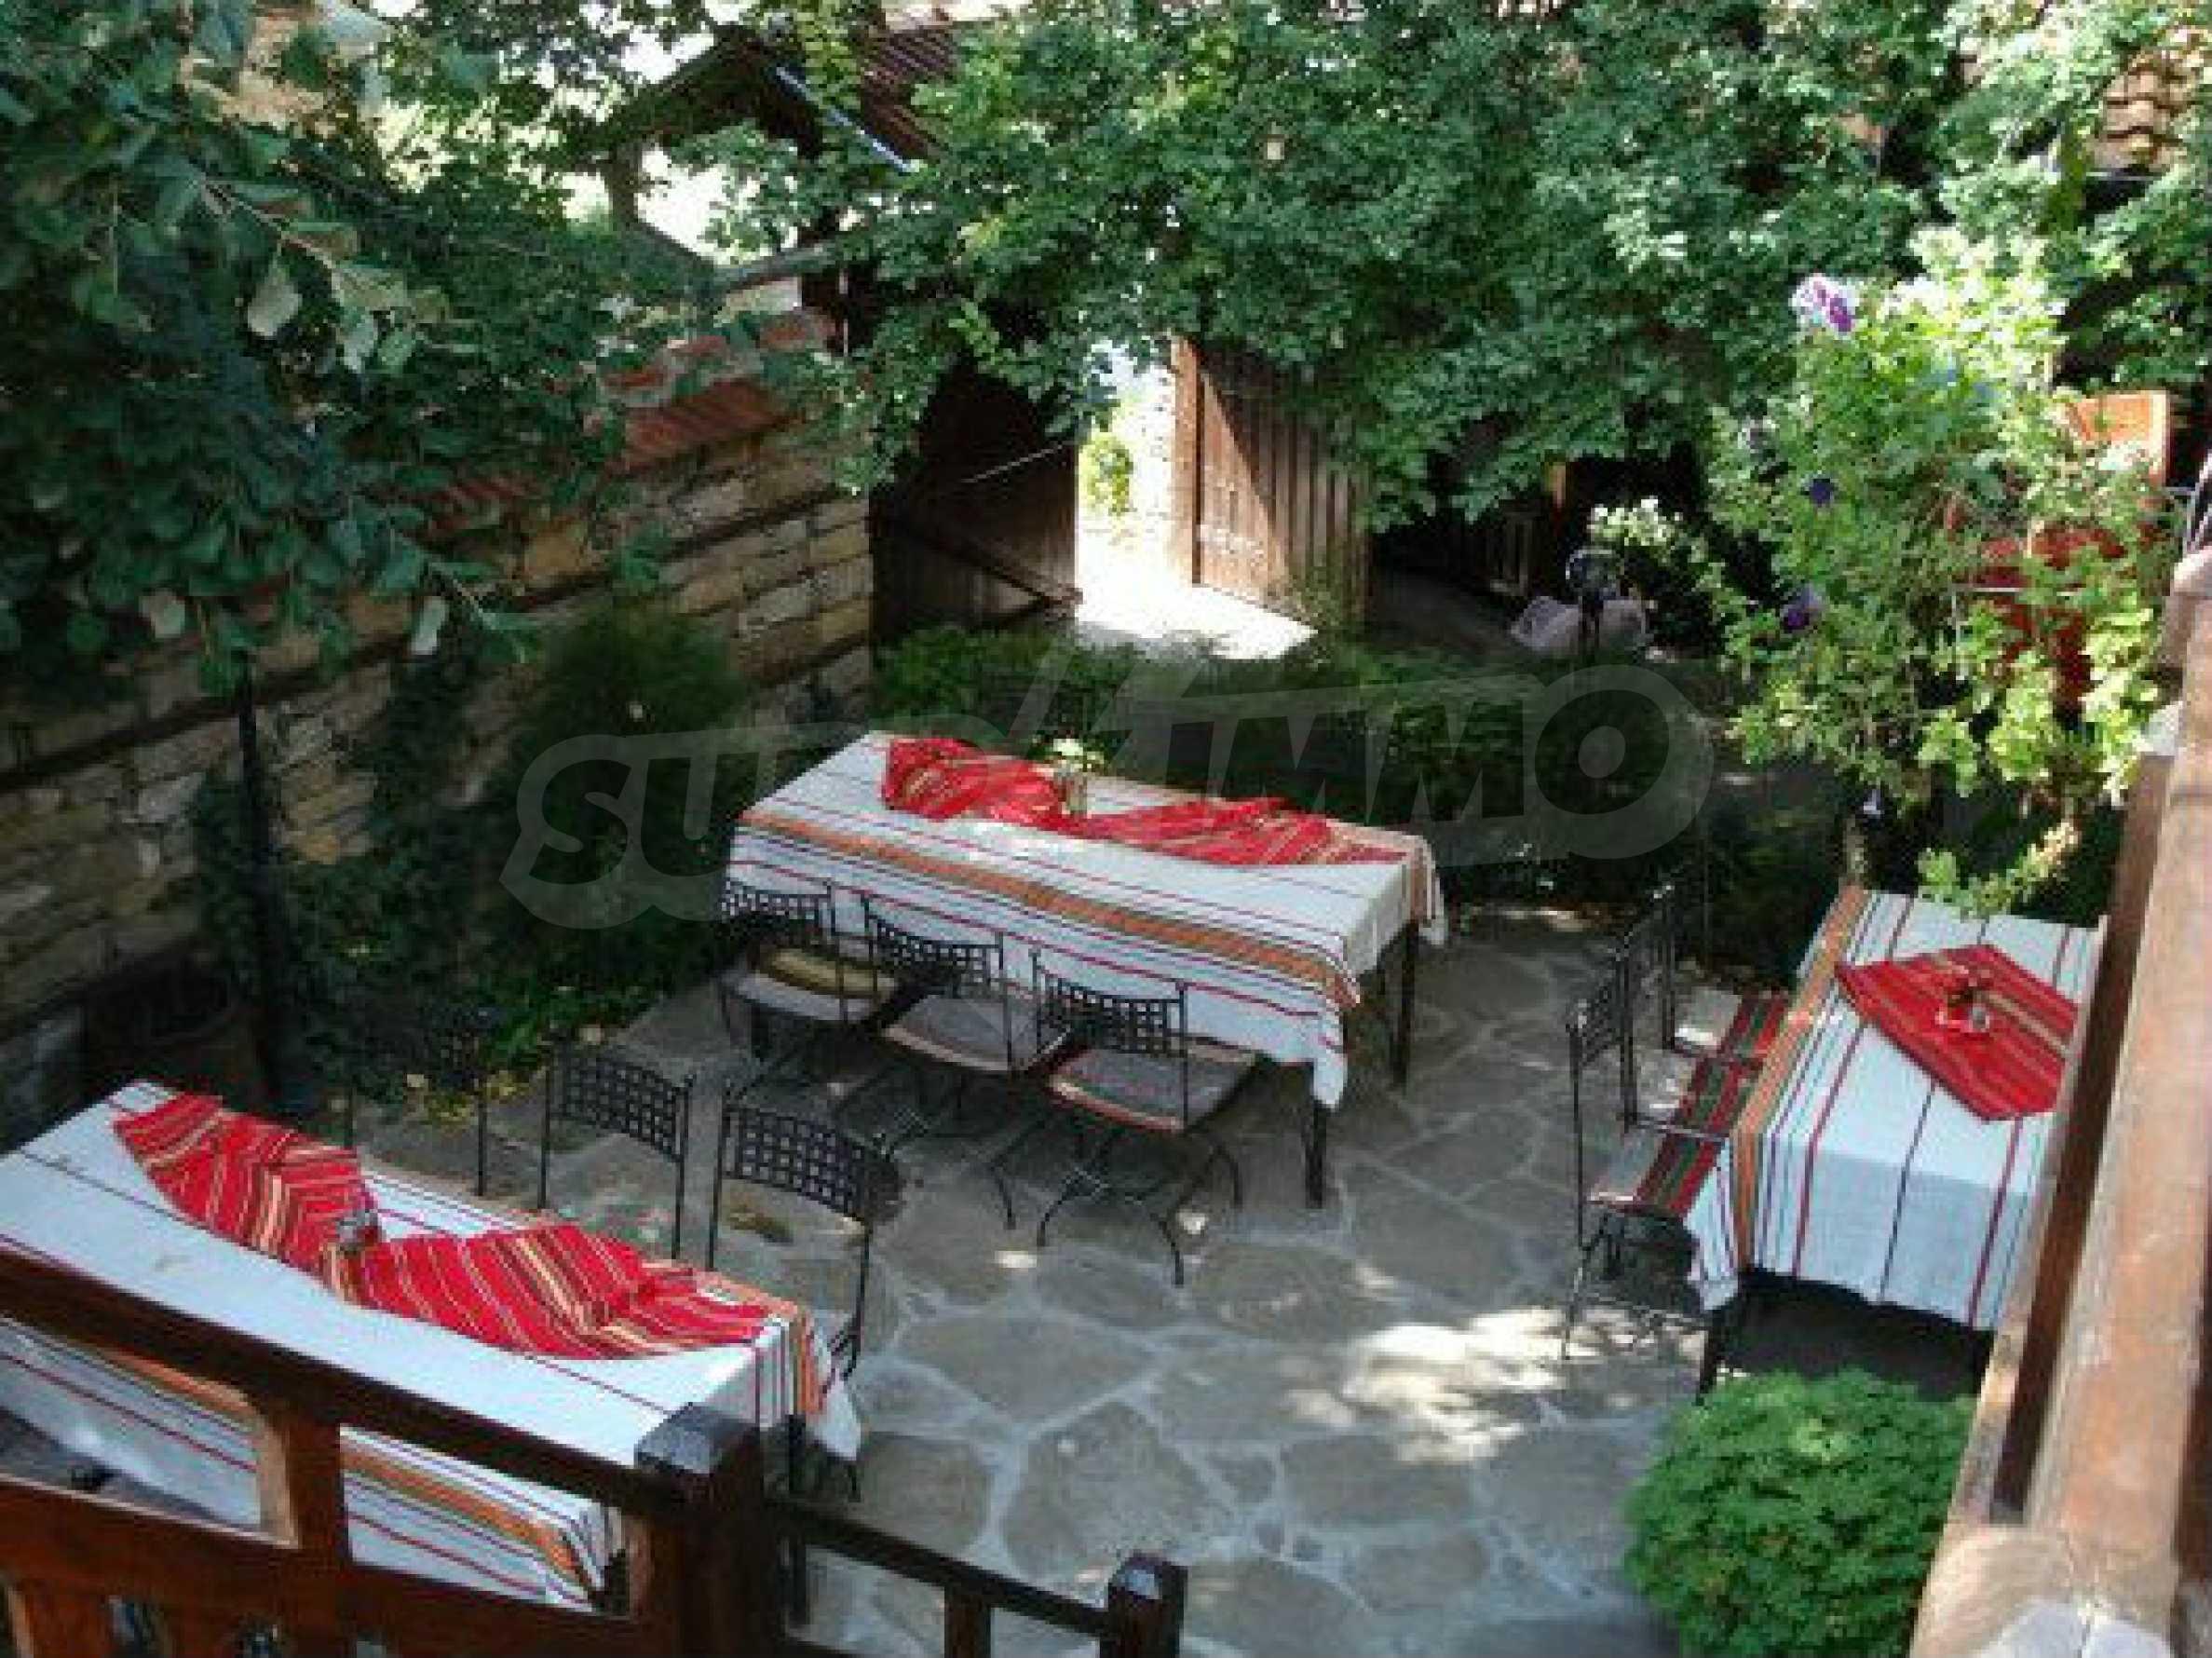 Hotelanlage mit Restaurant am Ufer des Flusses Osam in Lovech 45